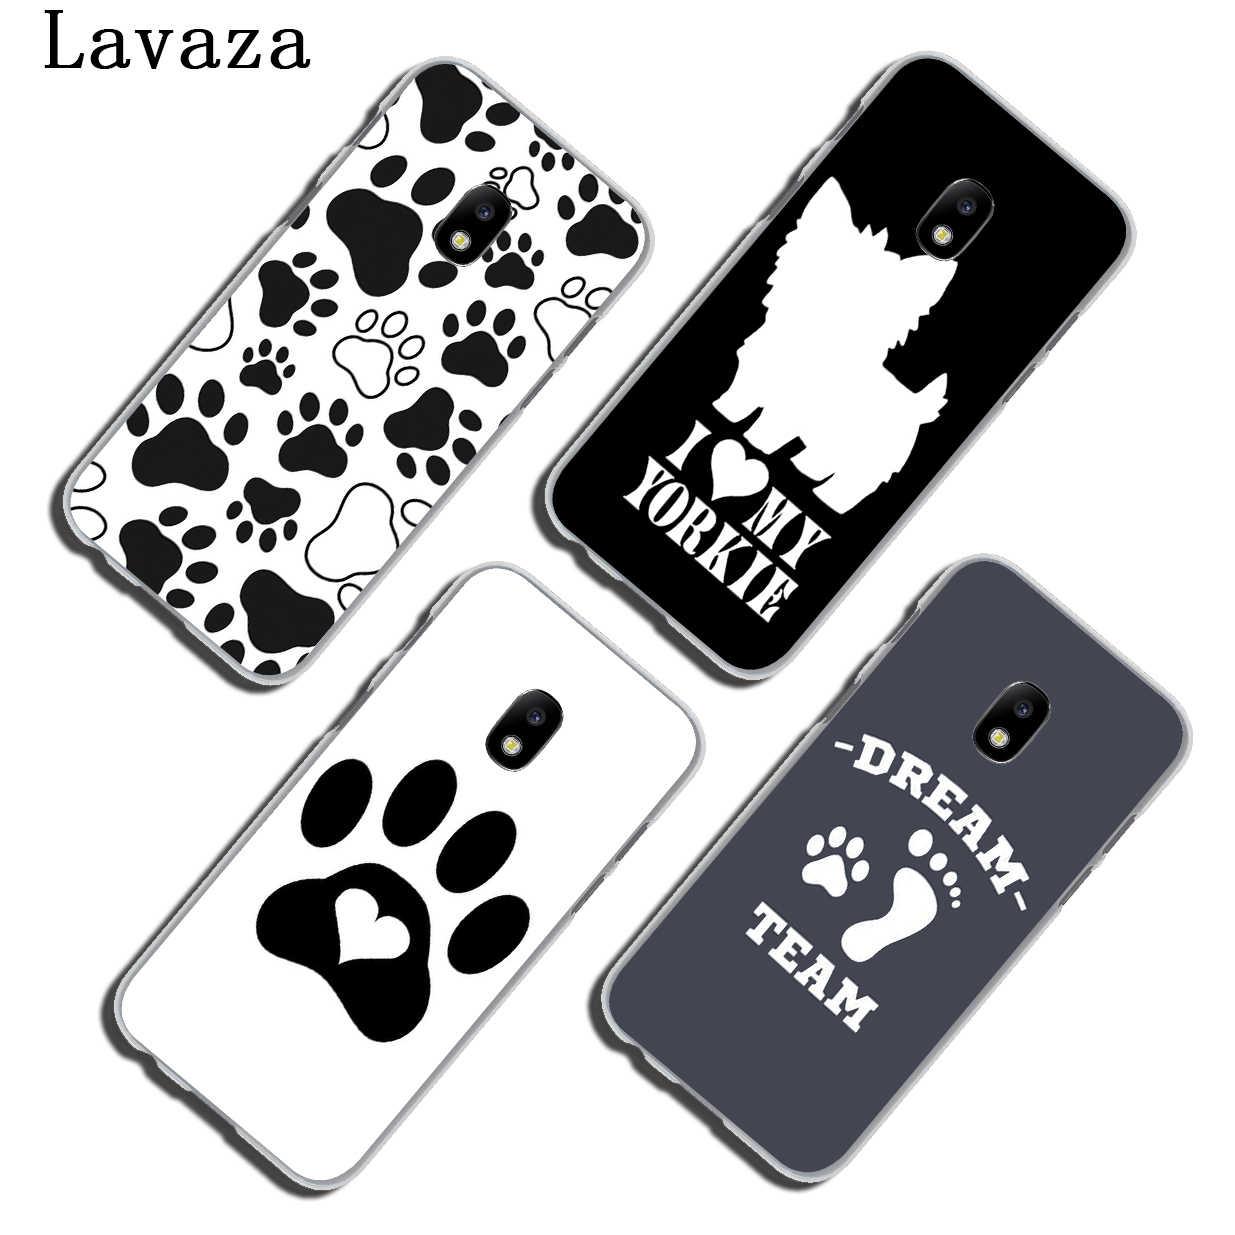 Lavaza отпечаток лапы собаки Щенячий Хаски чехол для телефона для samsung Galaxy J6 J5 J1 J2 J3 J7 2017 2016 2015 премьер-J7 EU версия крышка